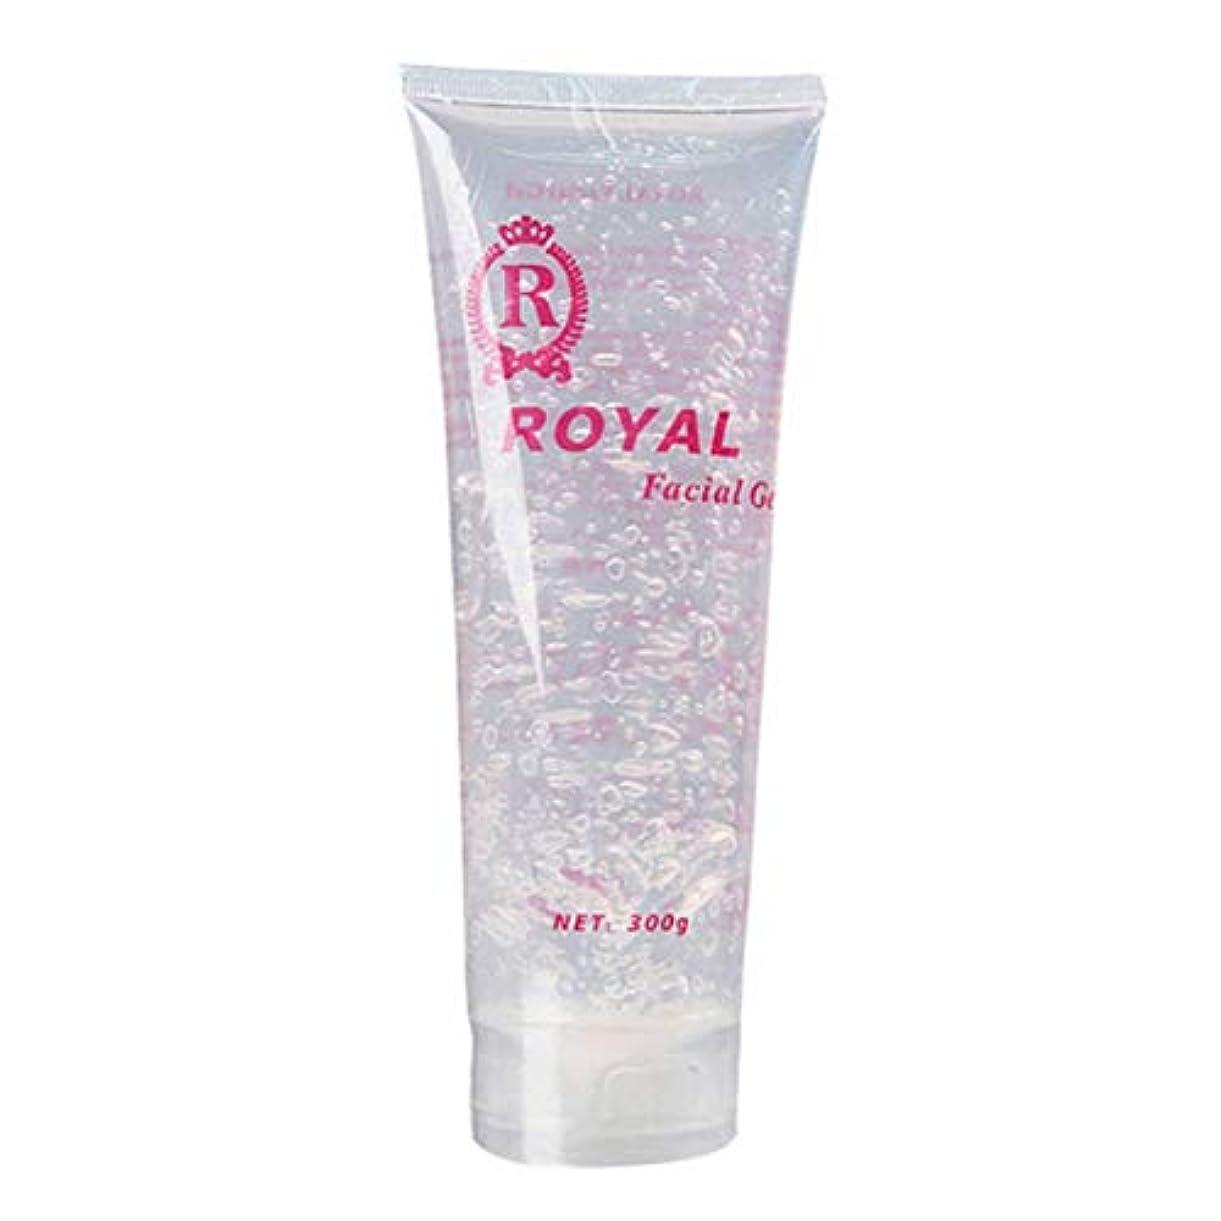 Intercorey Beauty Equipment Import Gel Skin Care Moisturizing Firming Body Shaping Beauty Essence Importing Instrument...